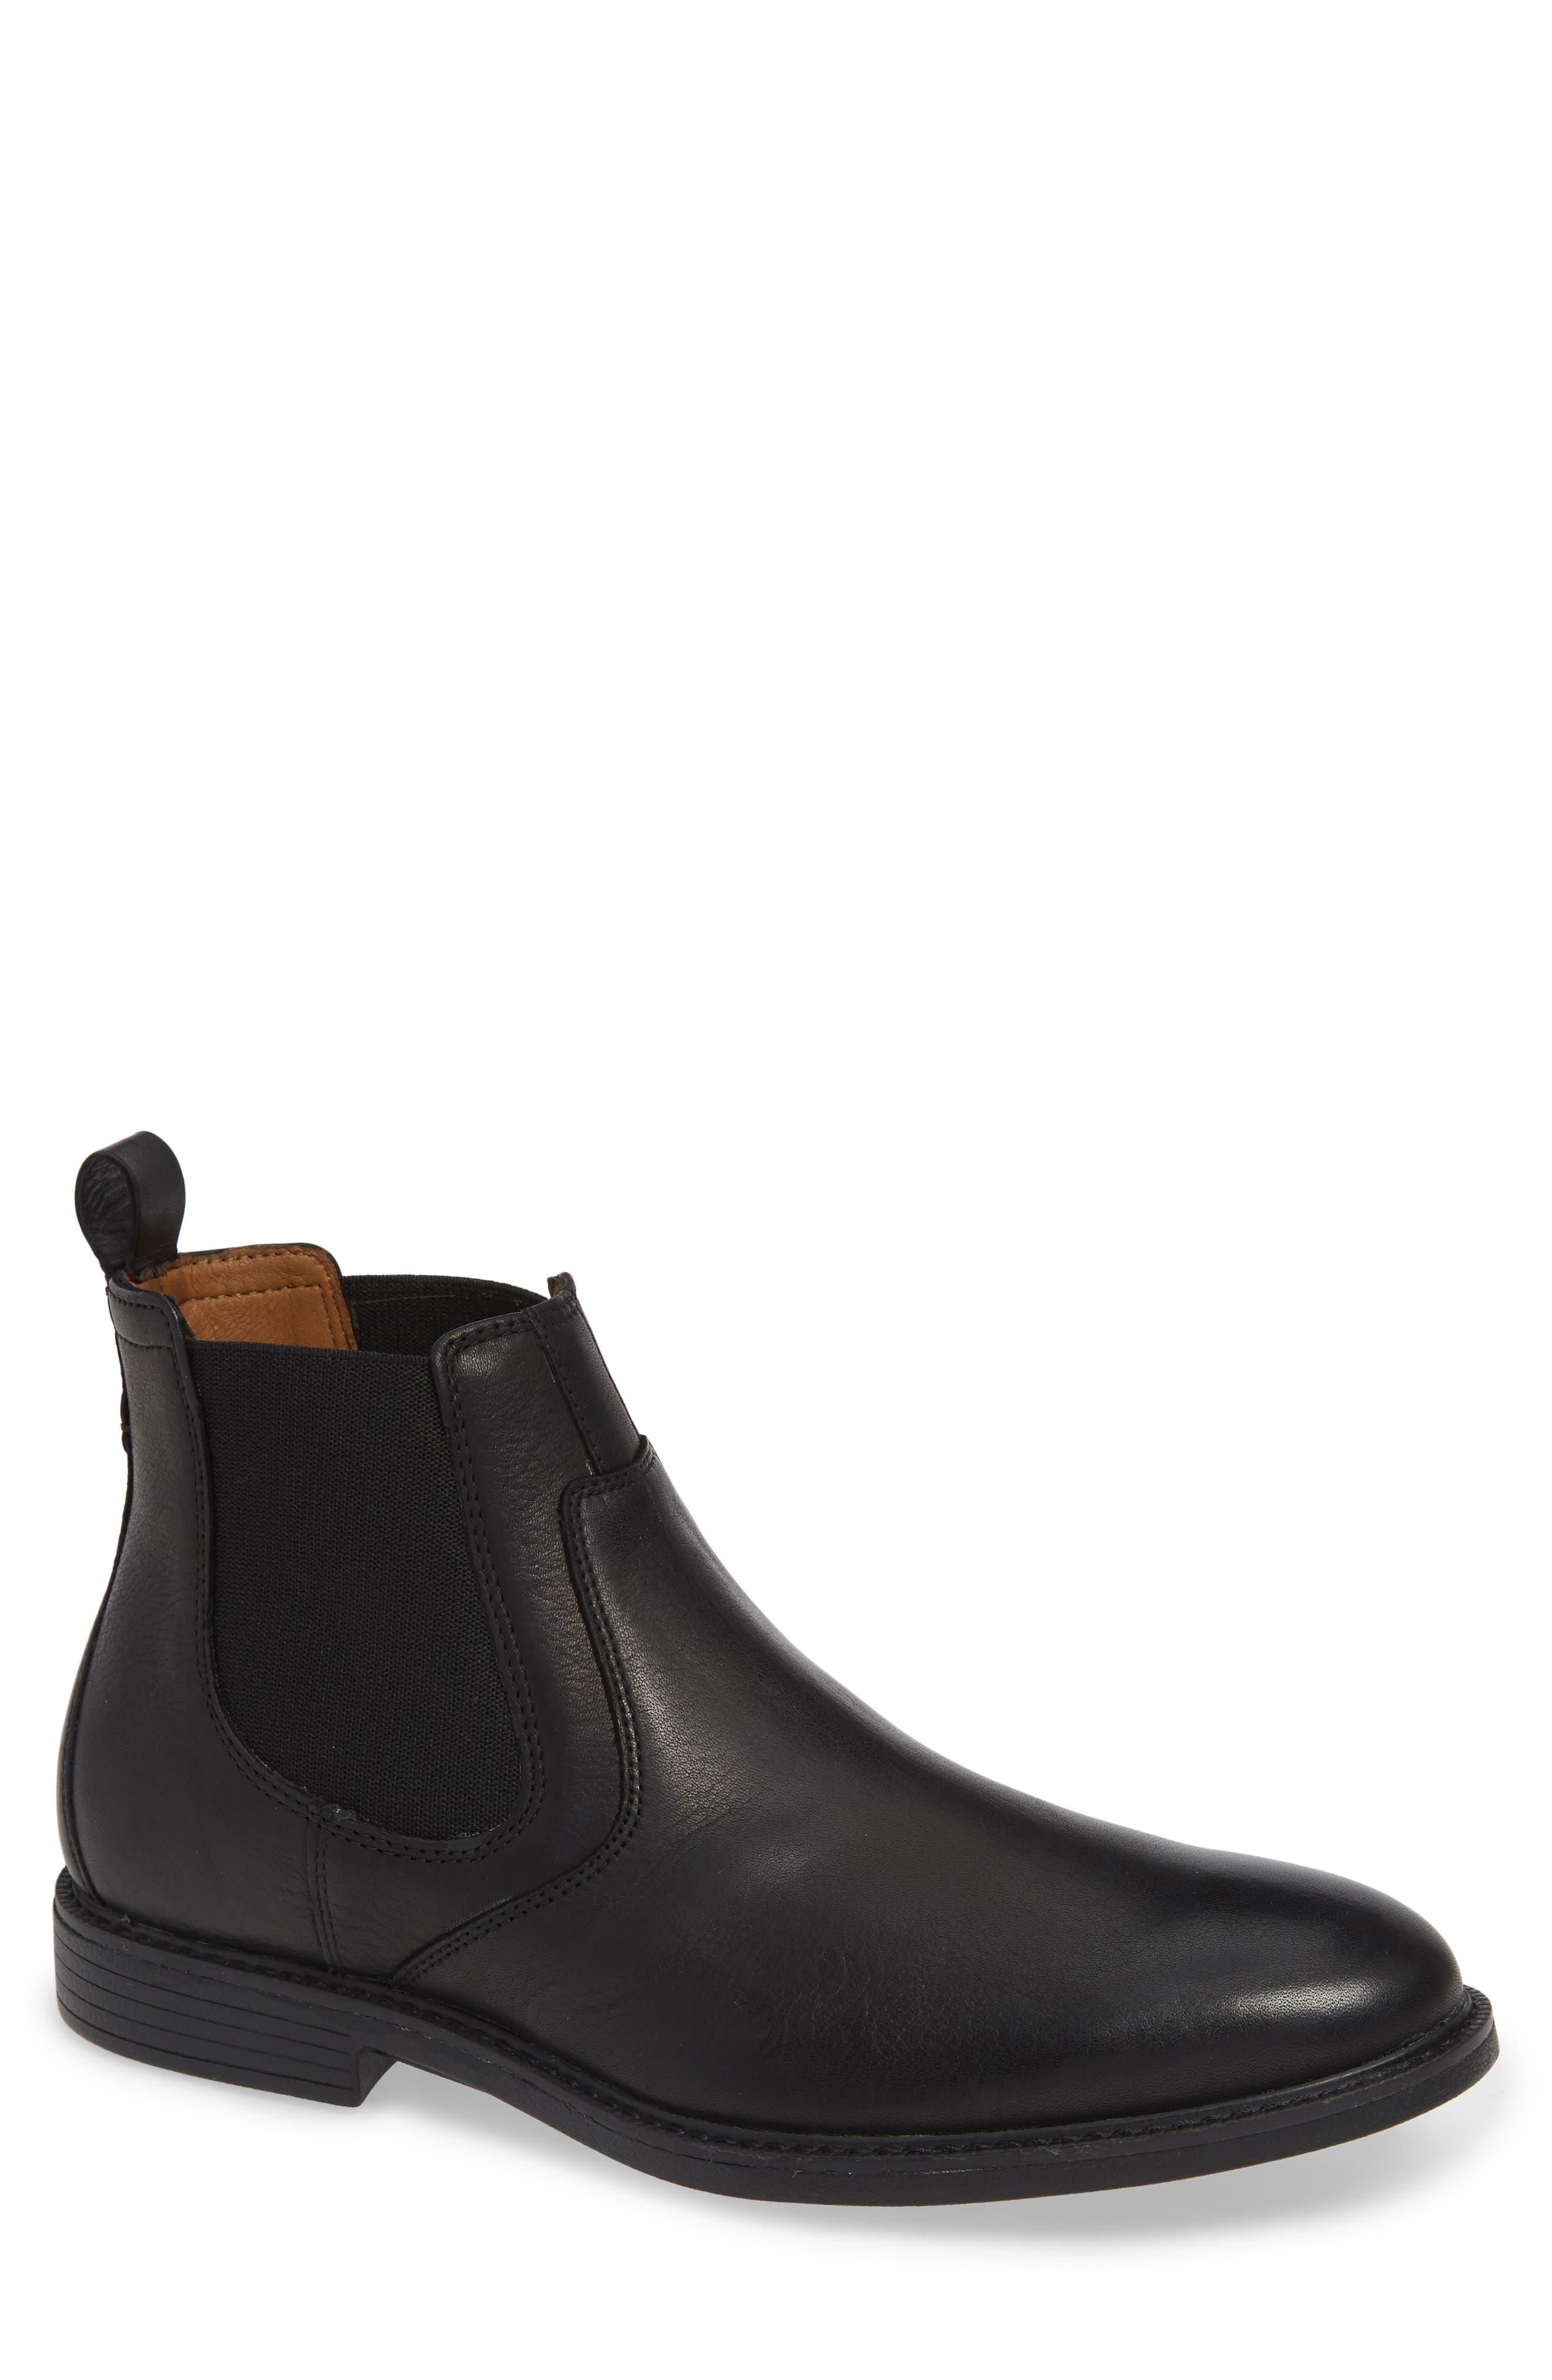 Johnston & Murphy Hollis Waterproof Chelsea Boot, Black